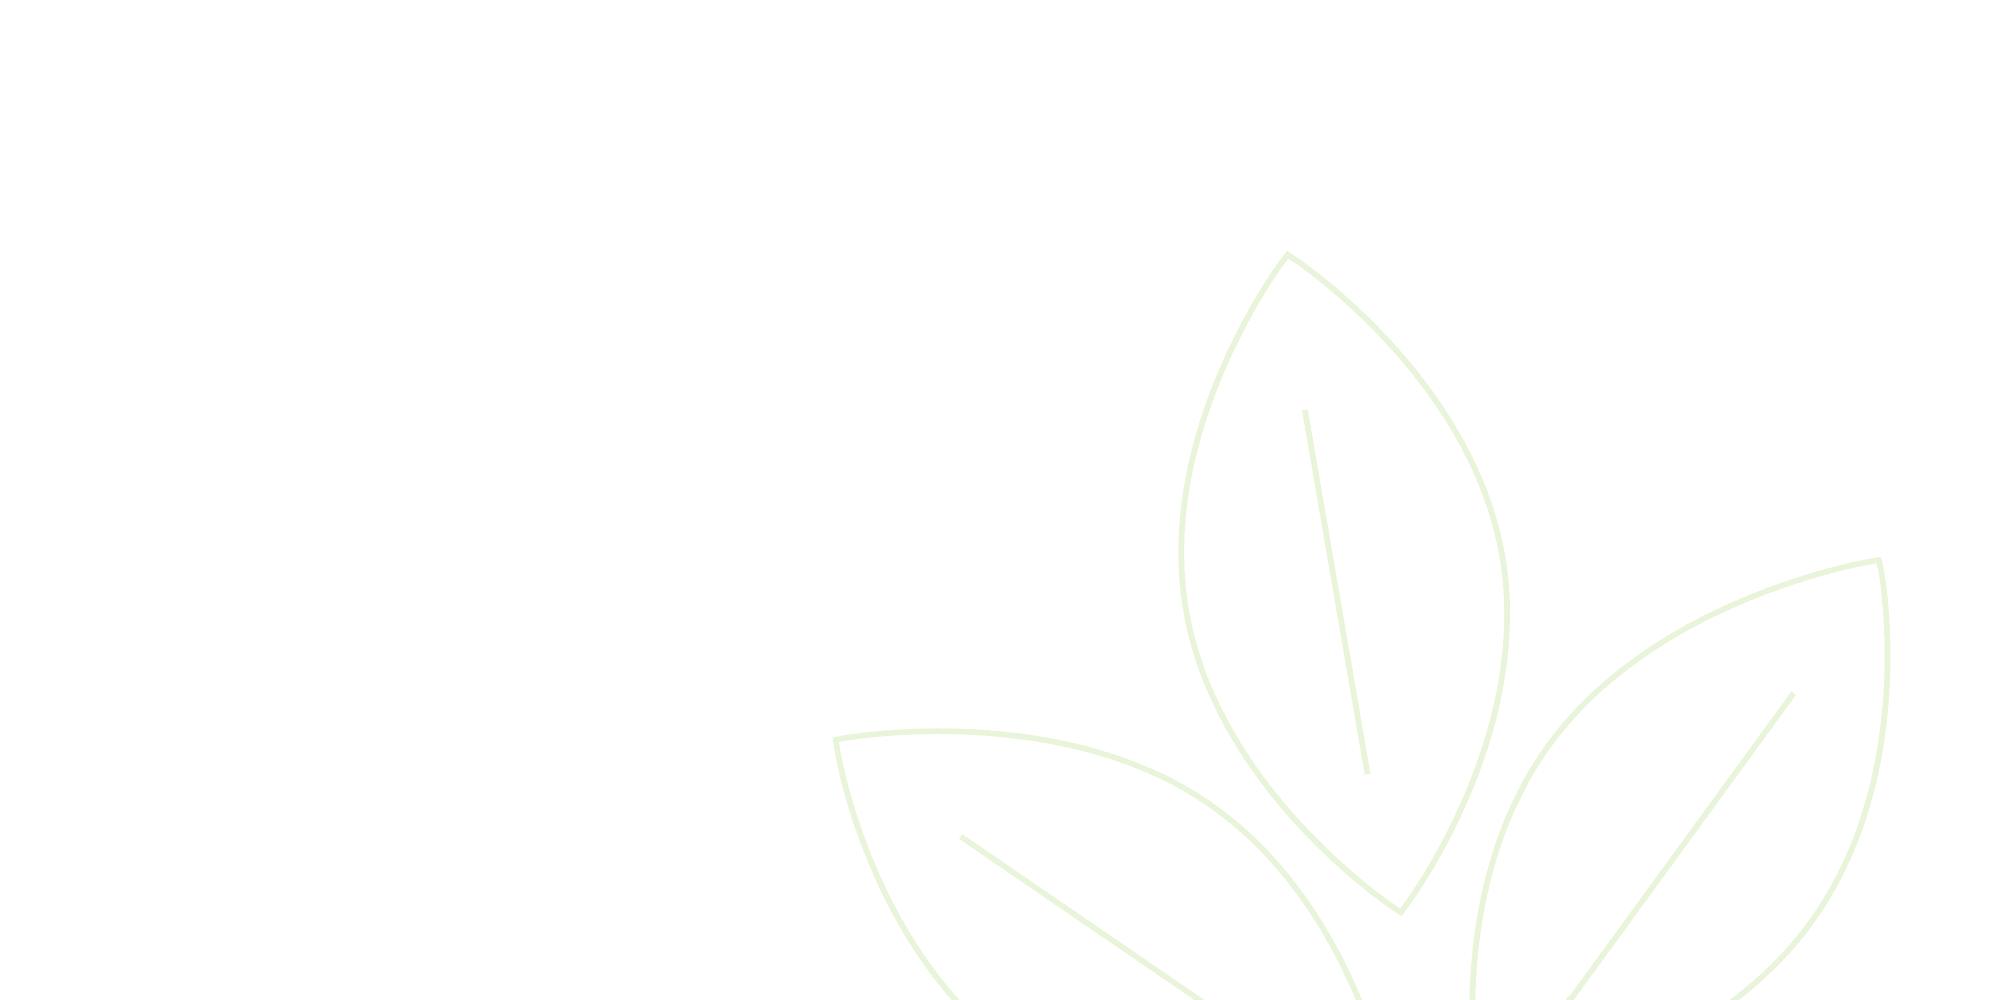 Simbolo Eco Simmons